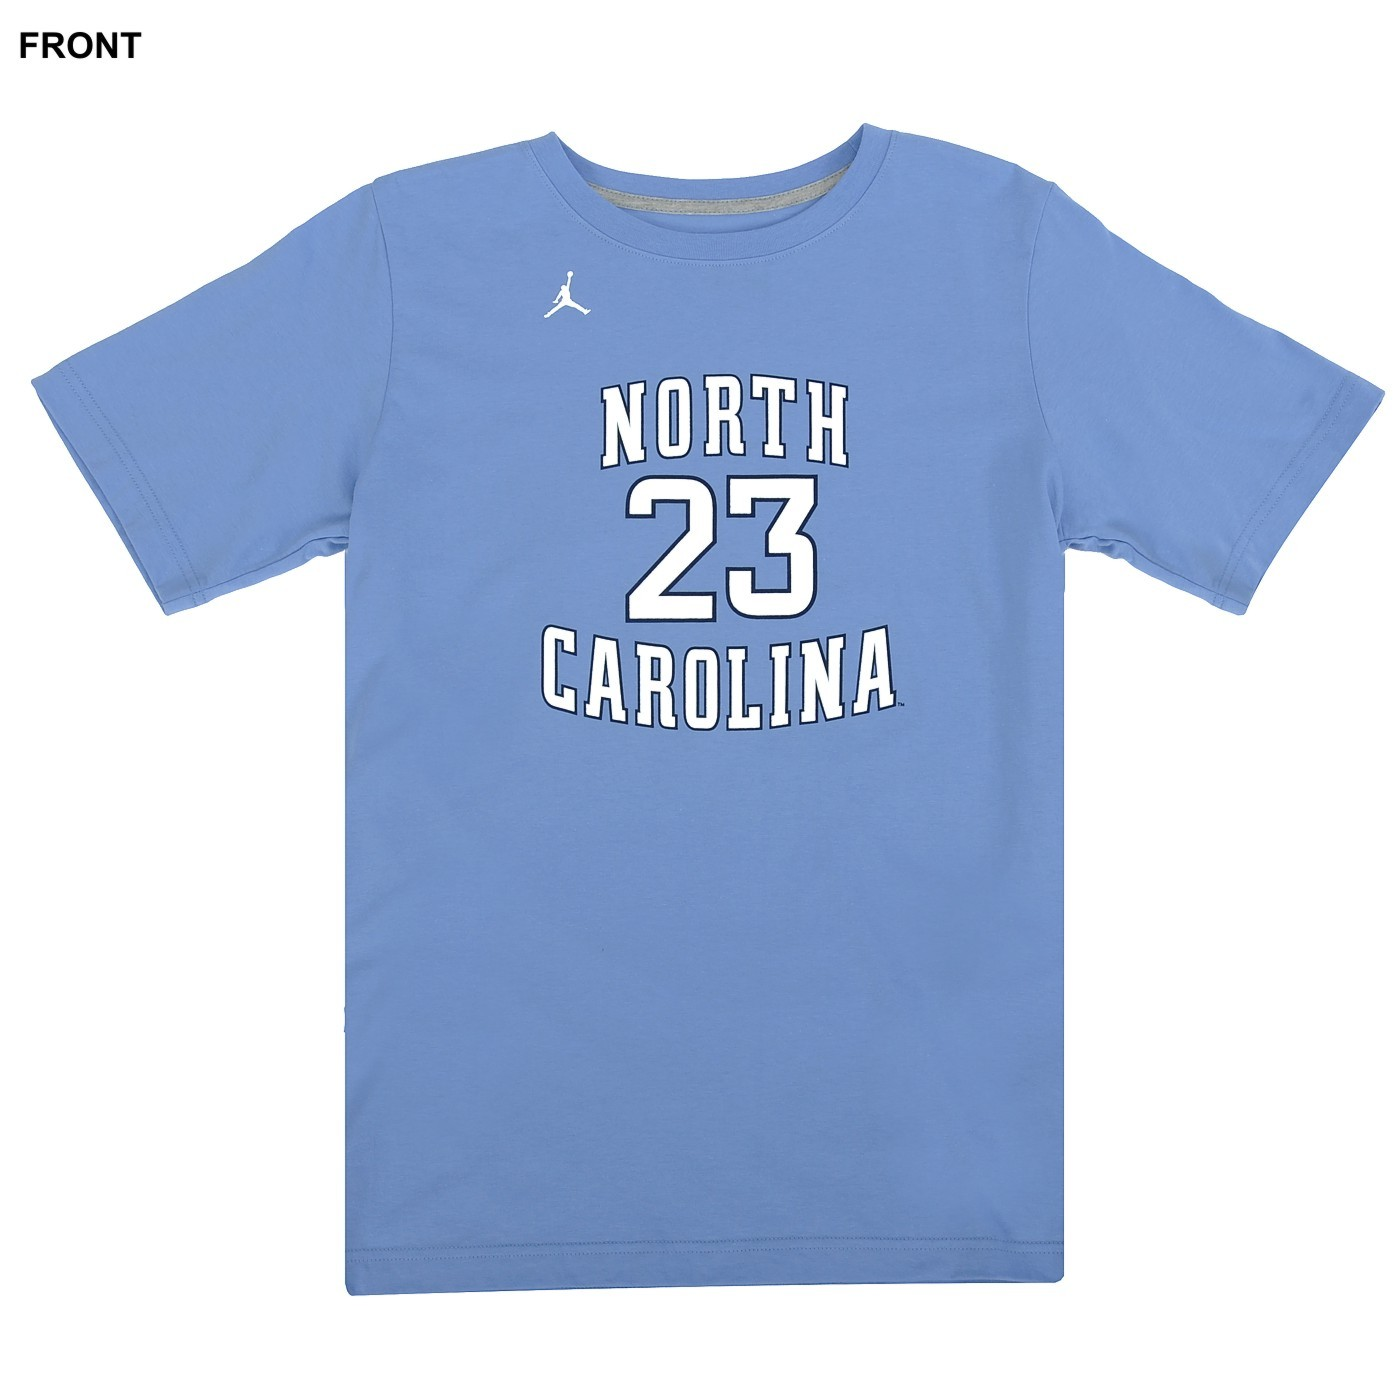 c8055705a4b Johnny T-shirt - North Carolina Tar Heels - Nike Jordan #23 Replica  Basketball Jersey T (CB) by Nike